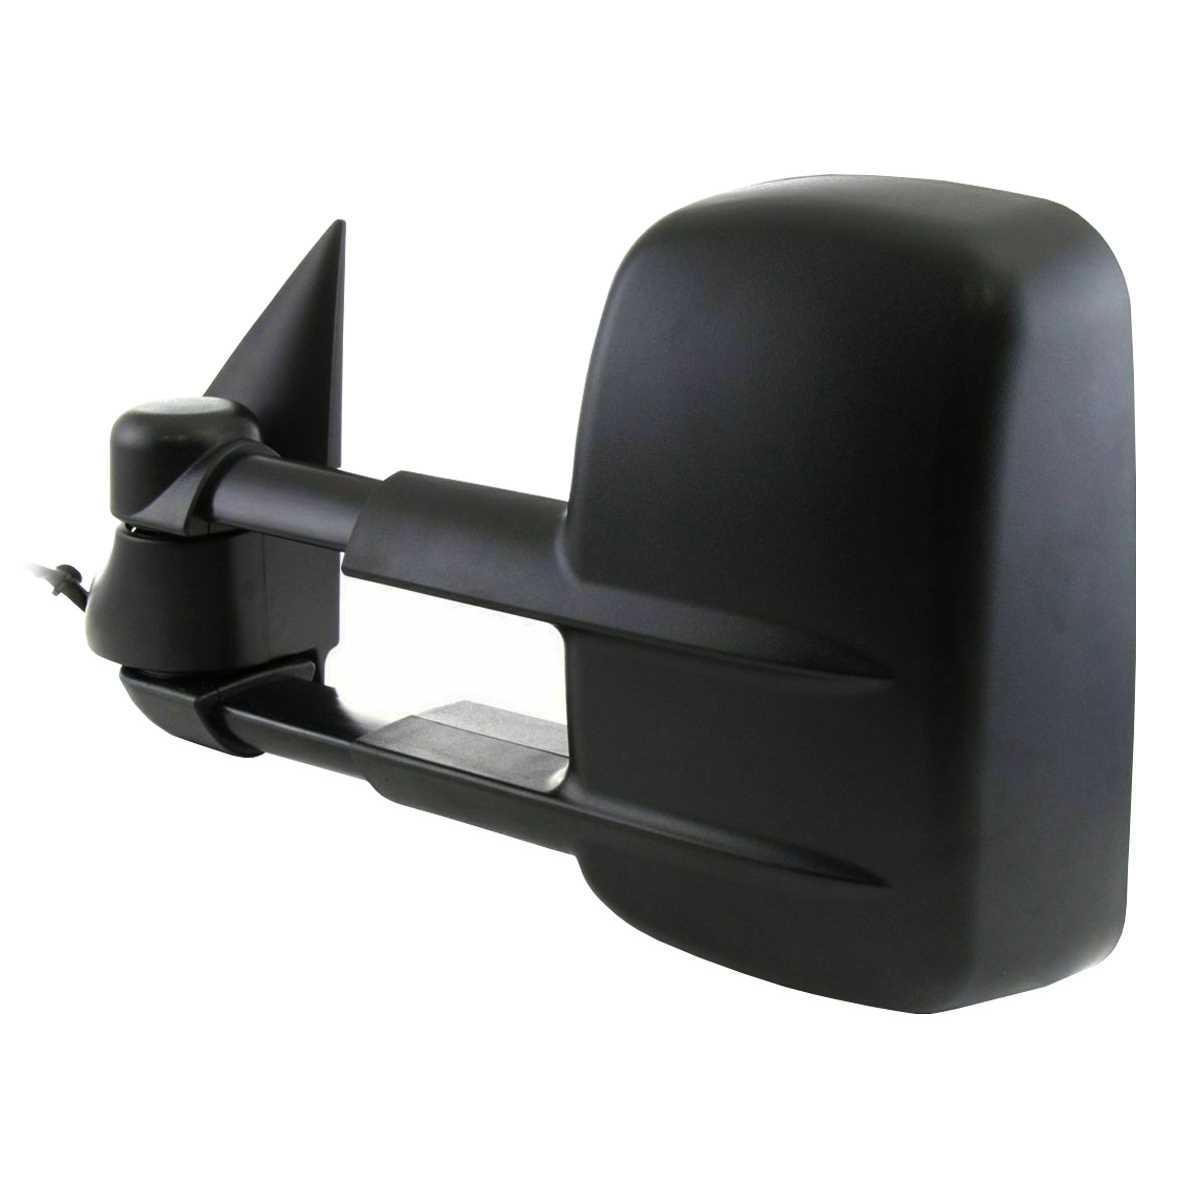 New-Pair-Power-Heated-Signal-Side-Mirror-Fits-2003-2006-Chevrolet-Silverado-1500 thumbnail 6